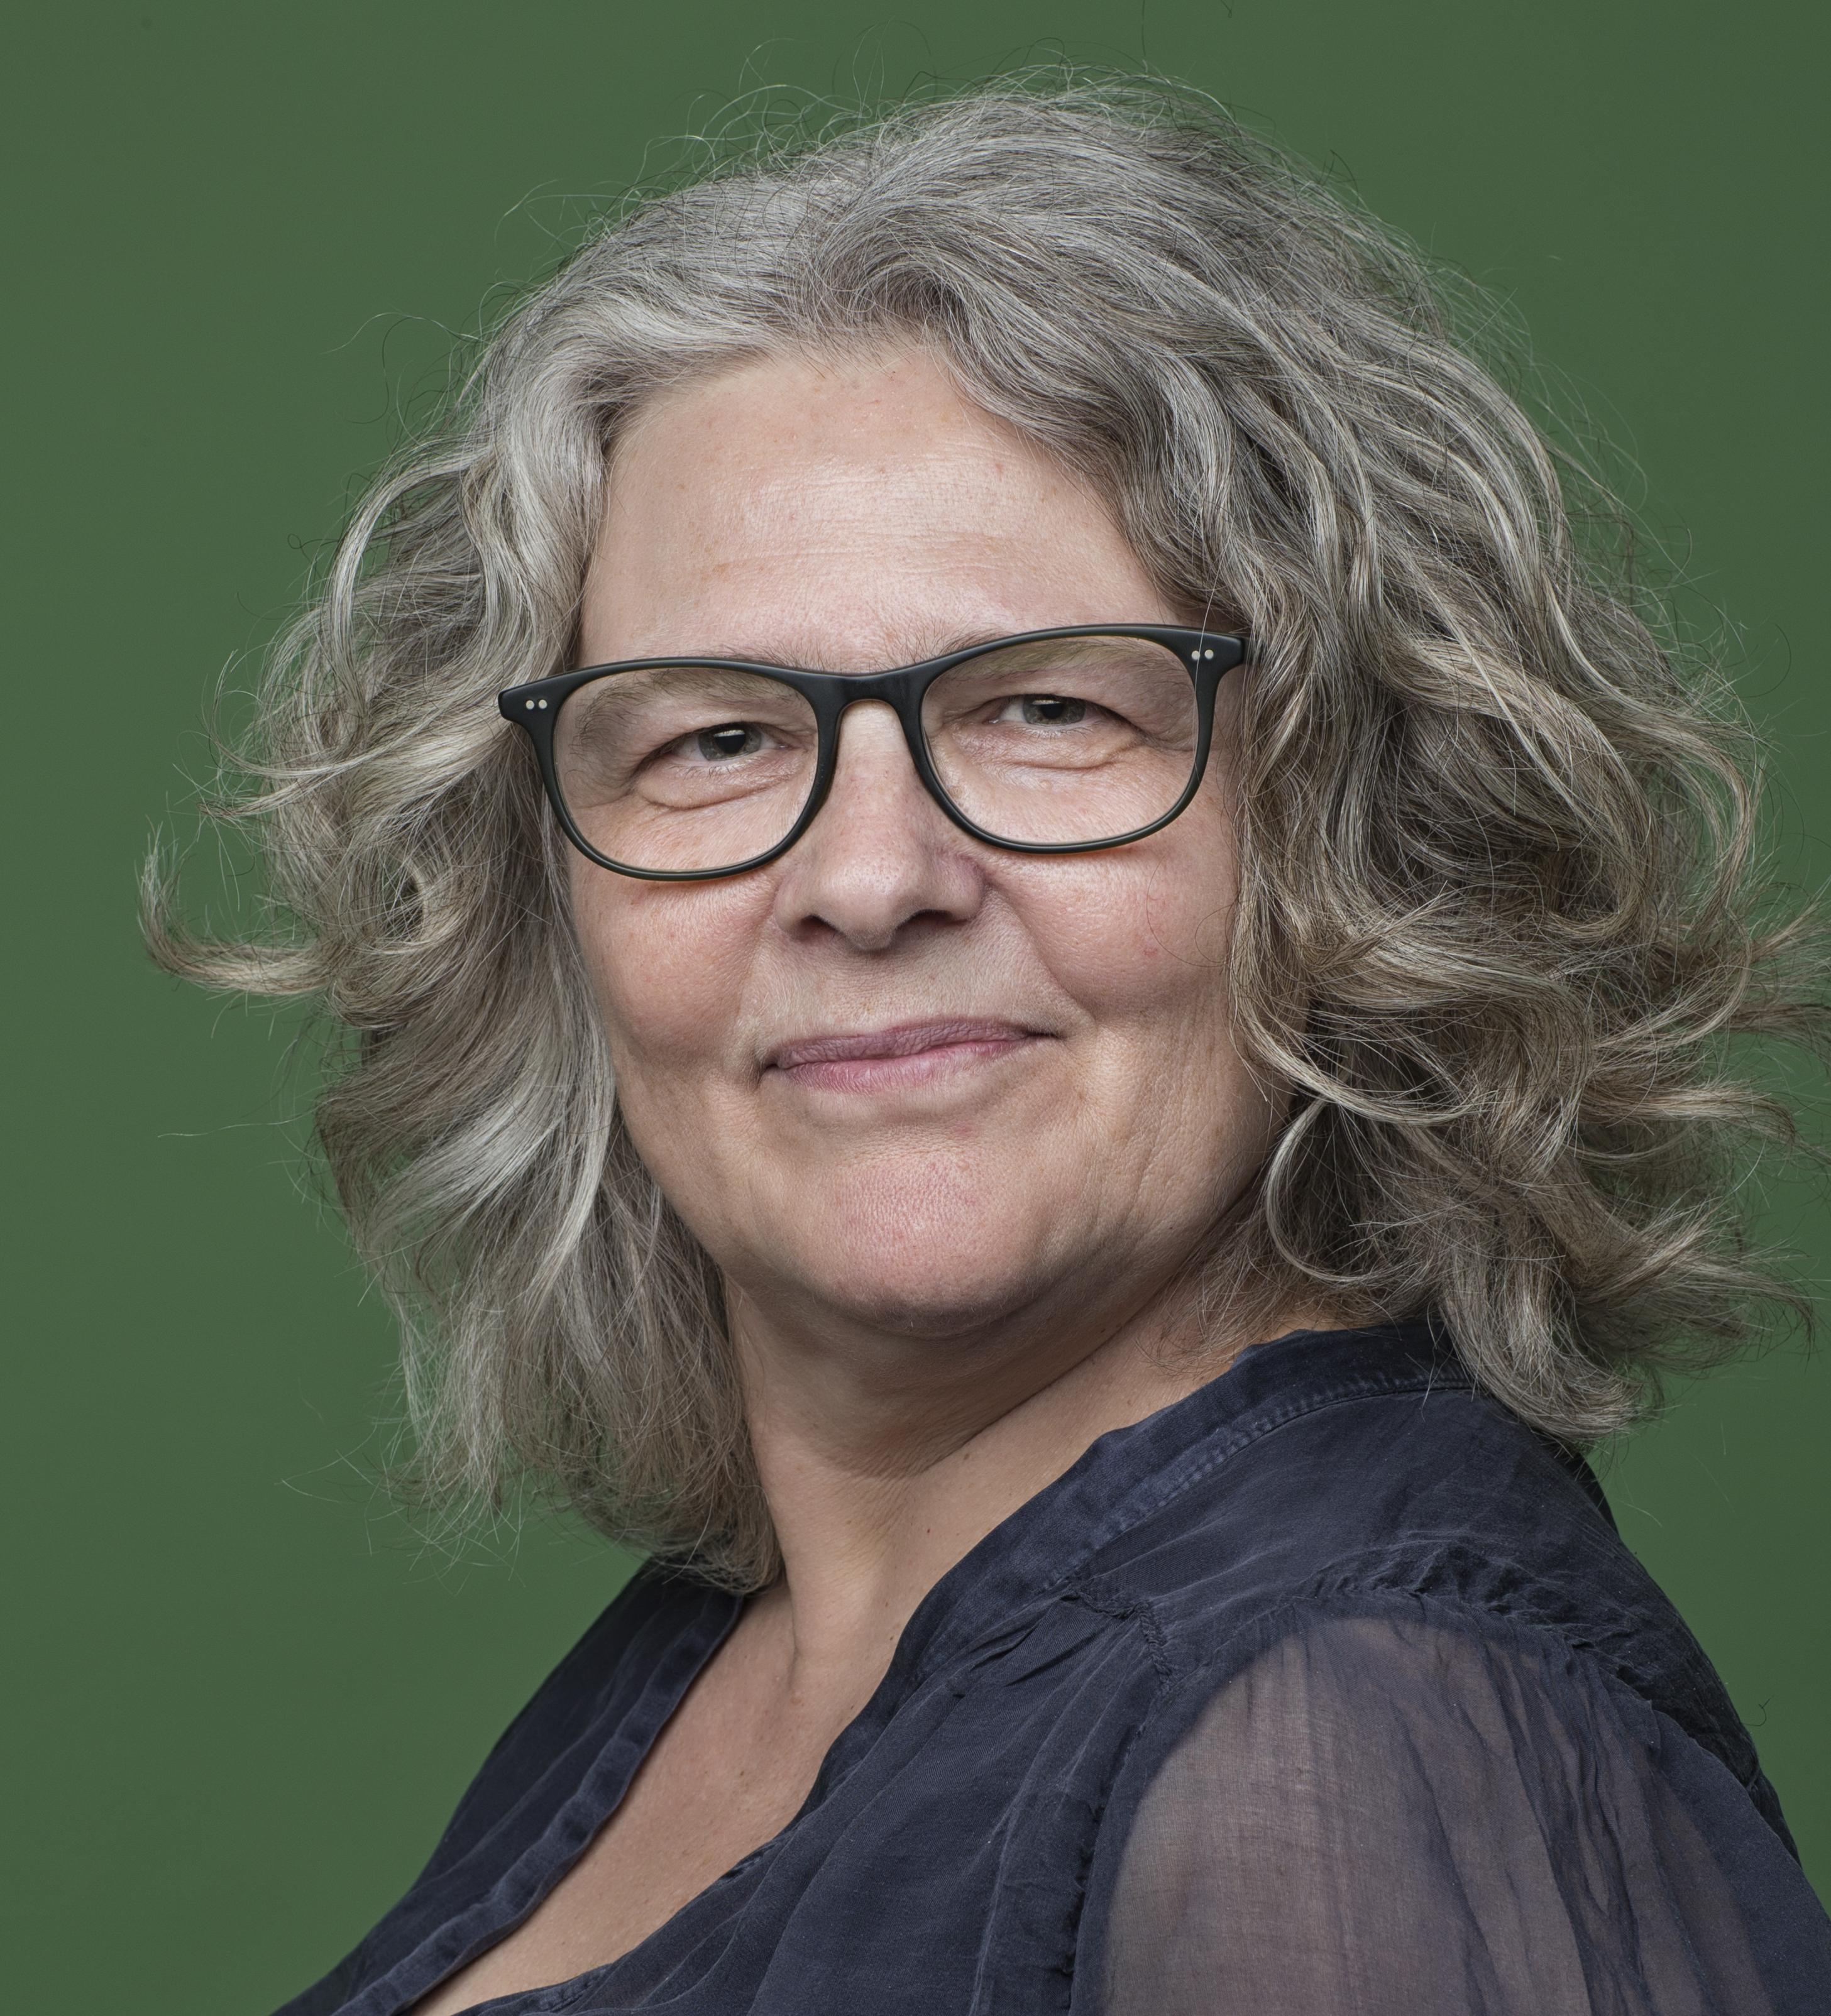 Bodil Marie Stavning Thomsen